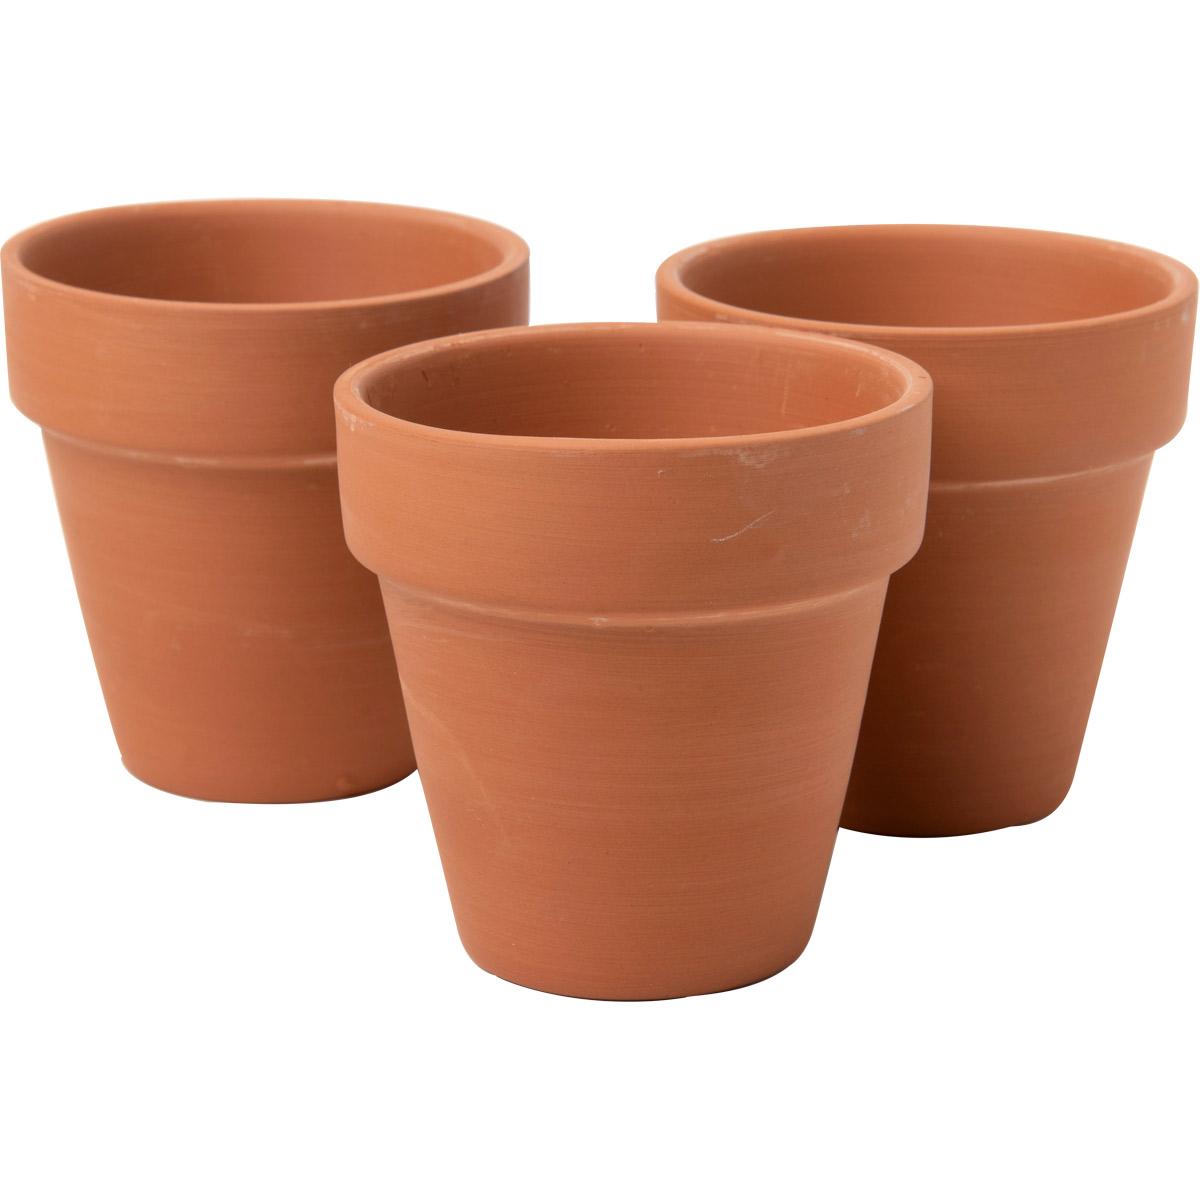 Plaid ® Surfaces - Terracotta Flower Pot, Small, 3 pc. - 44904